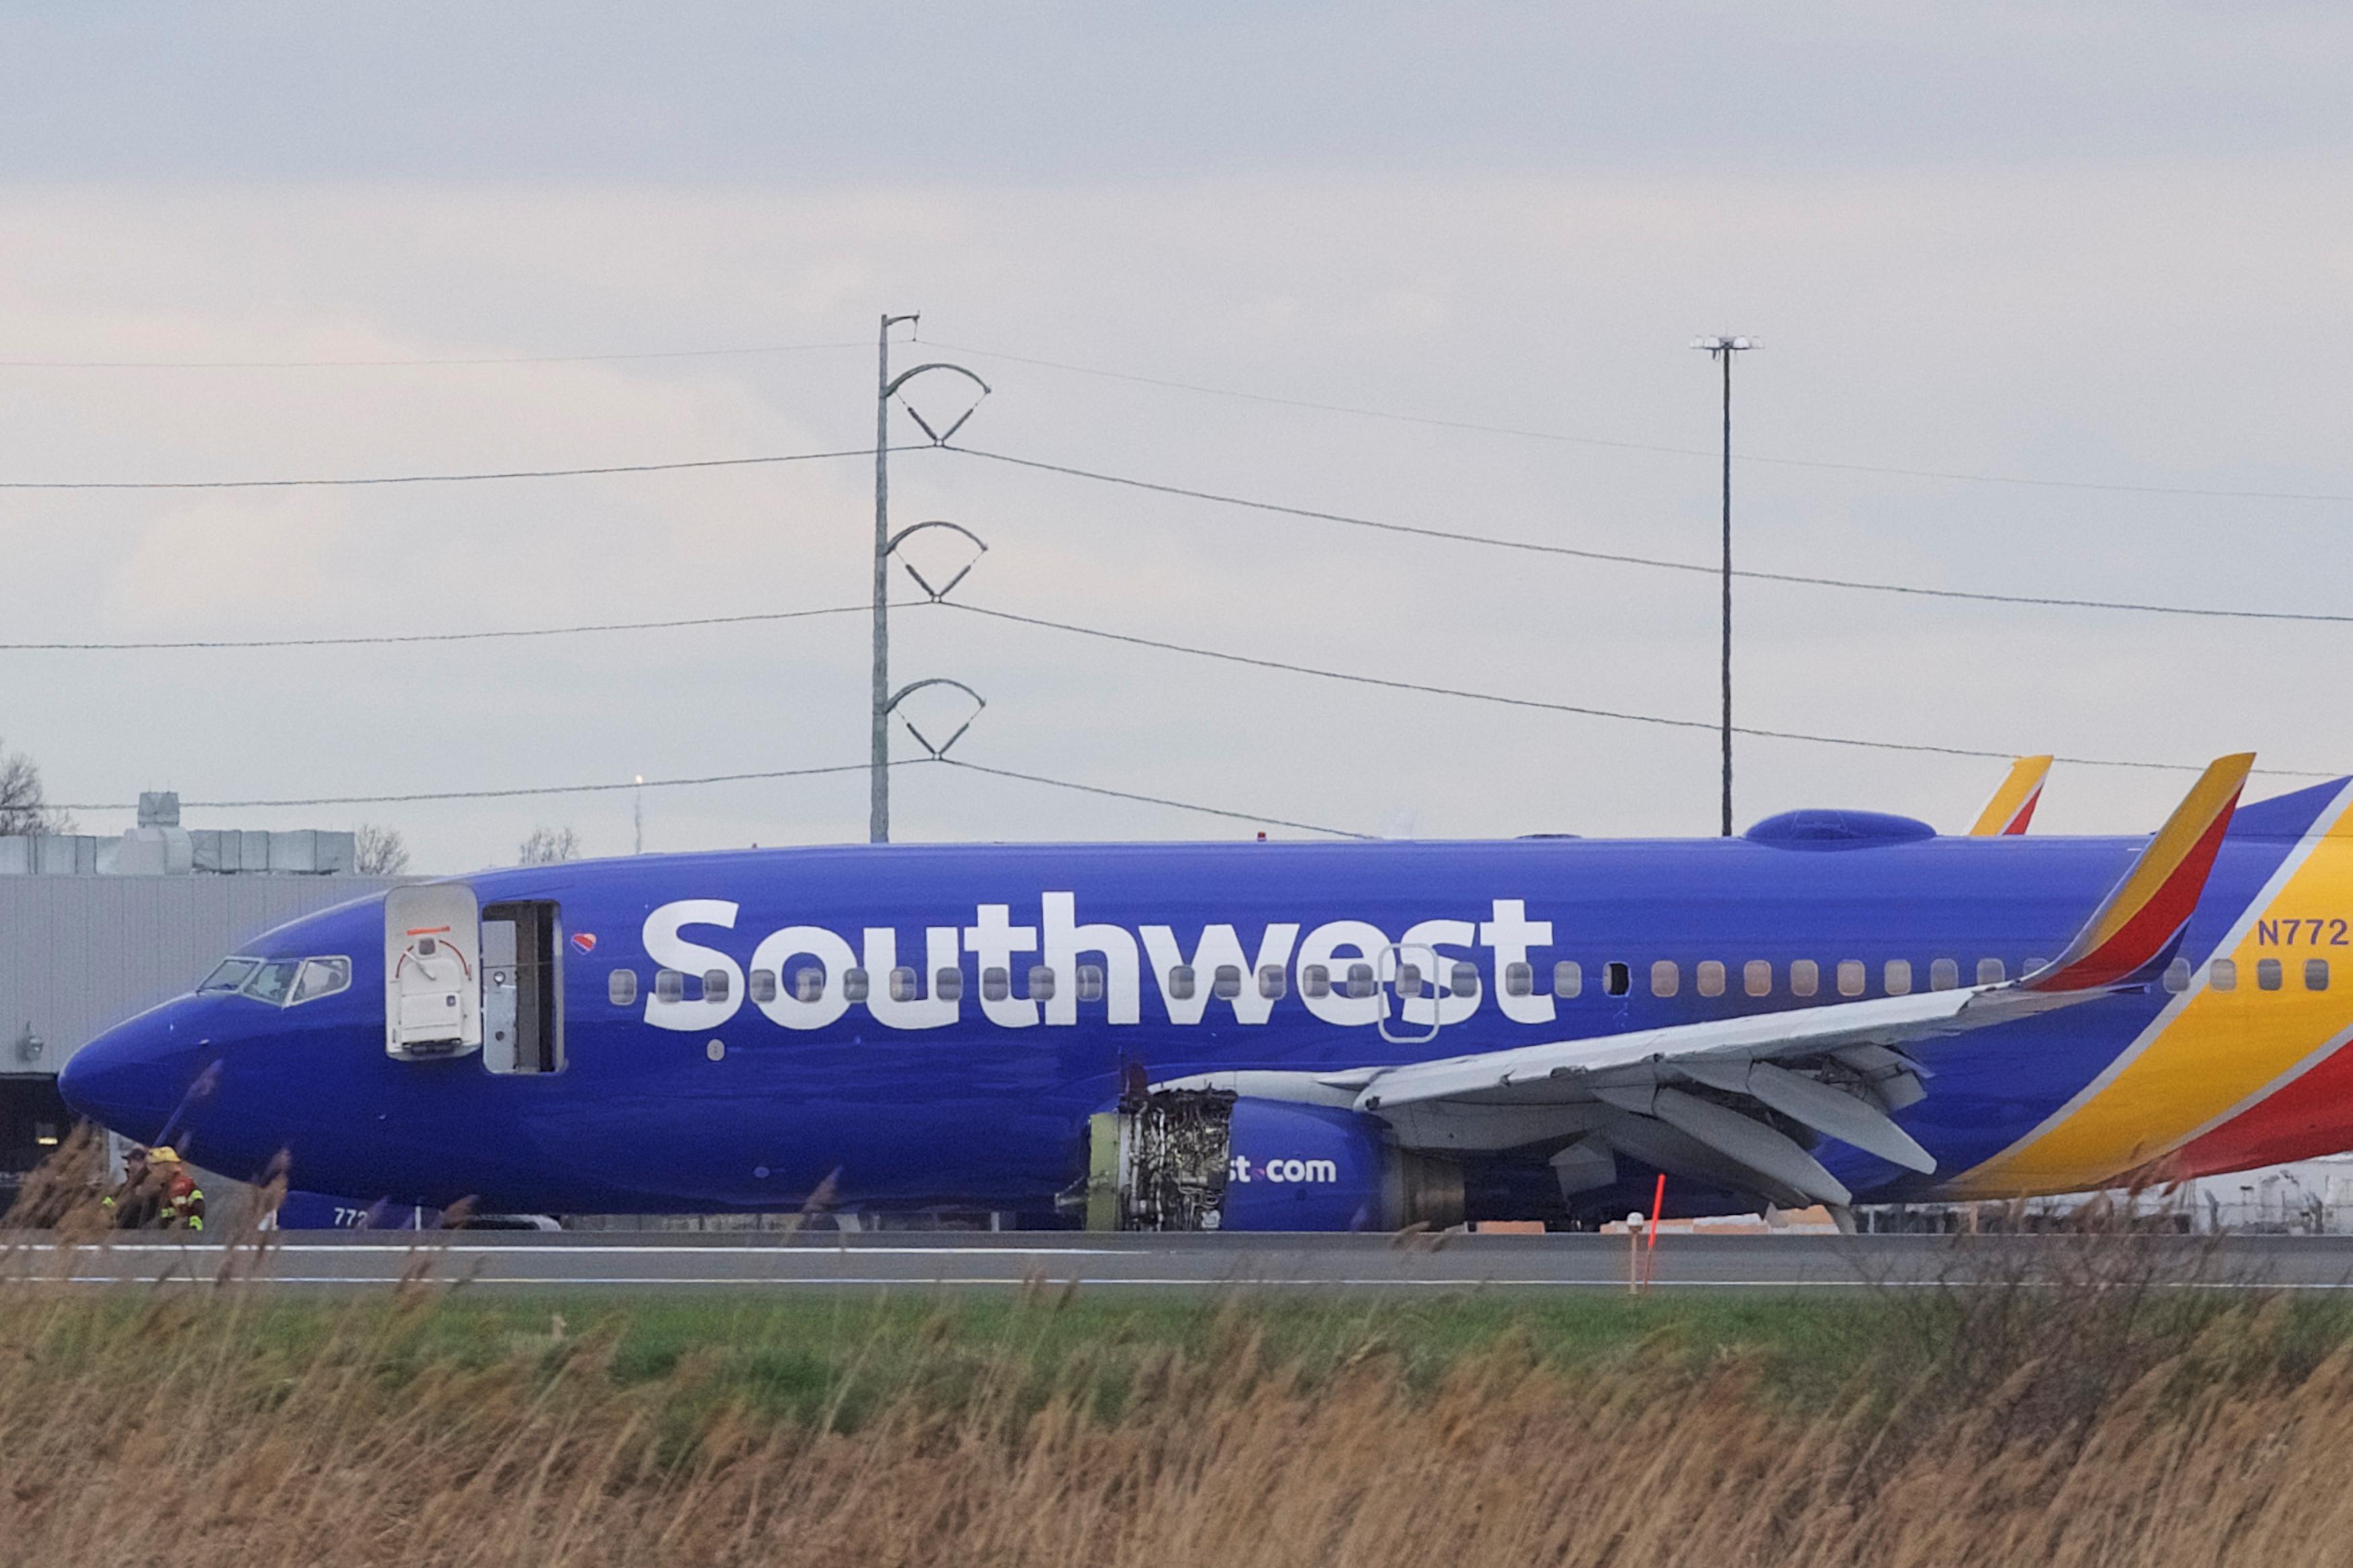 One killed when engine explodes on Southwest flight | FinanceTime